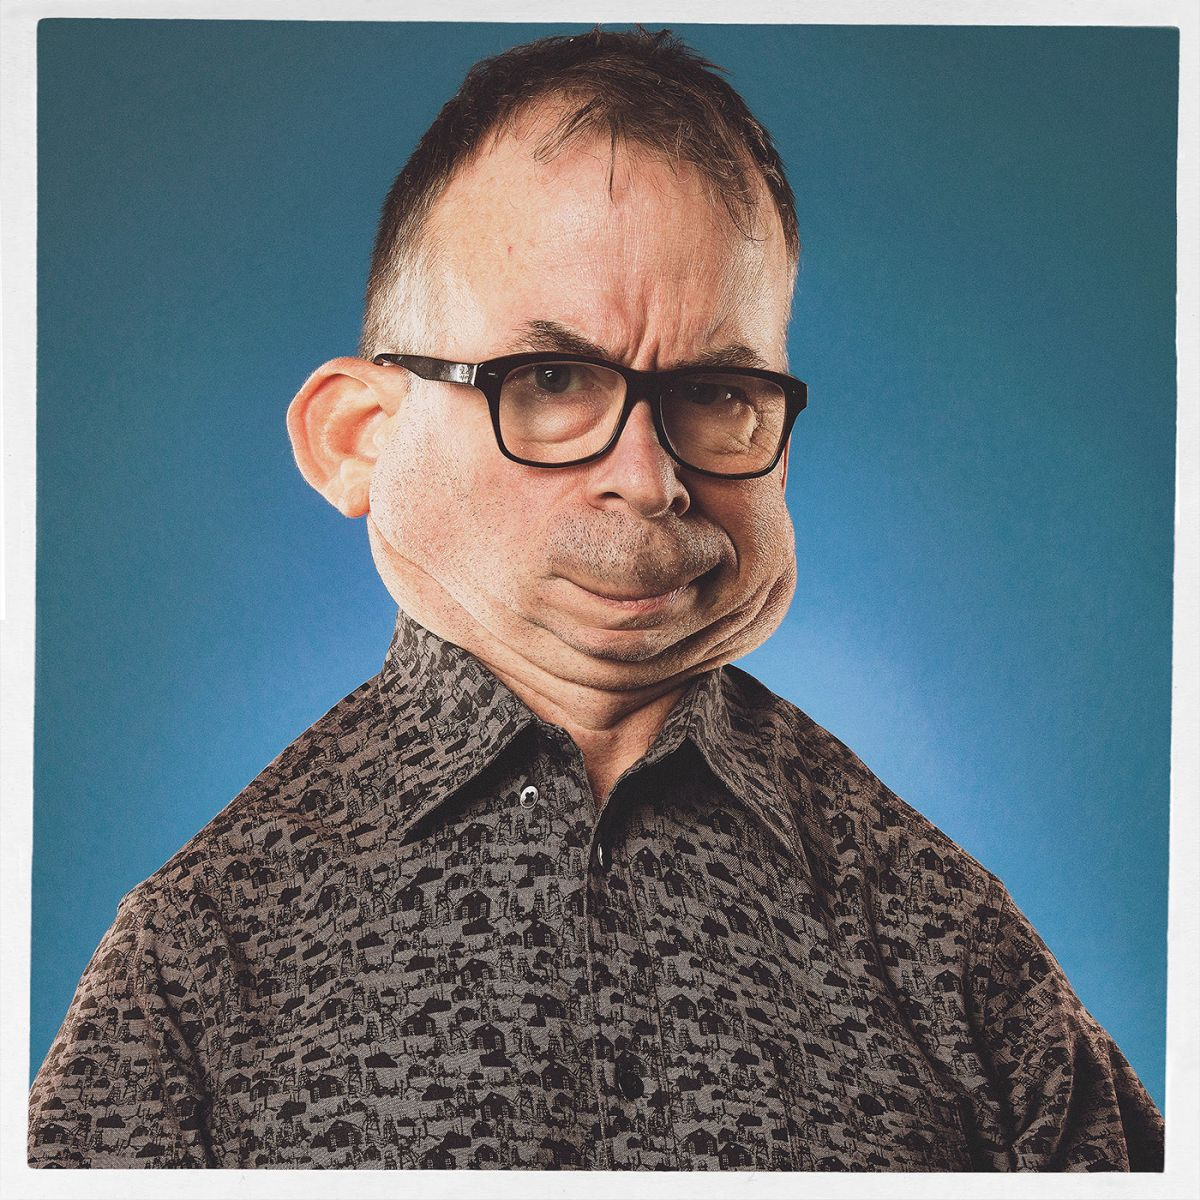 funny photo manipulation caricatures man bert mclendon